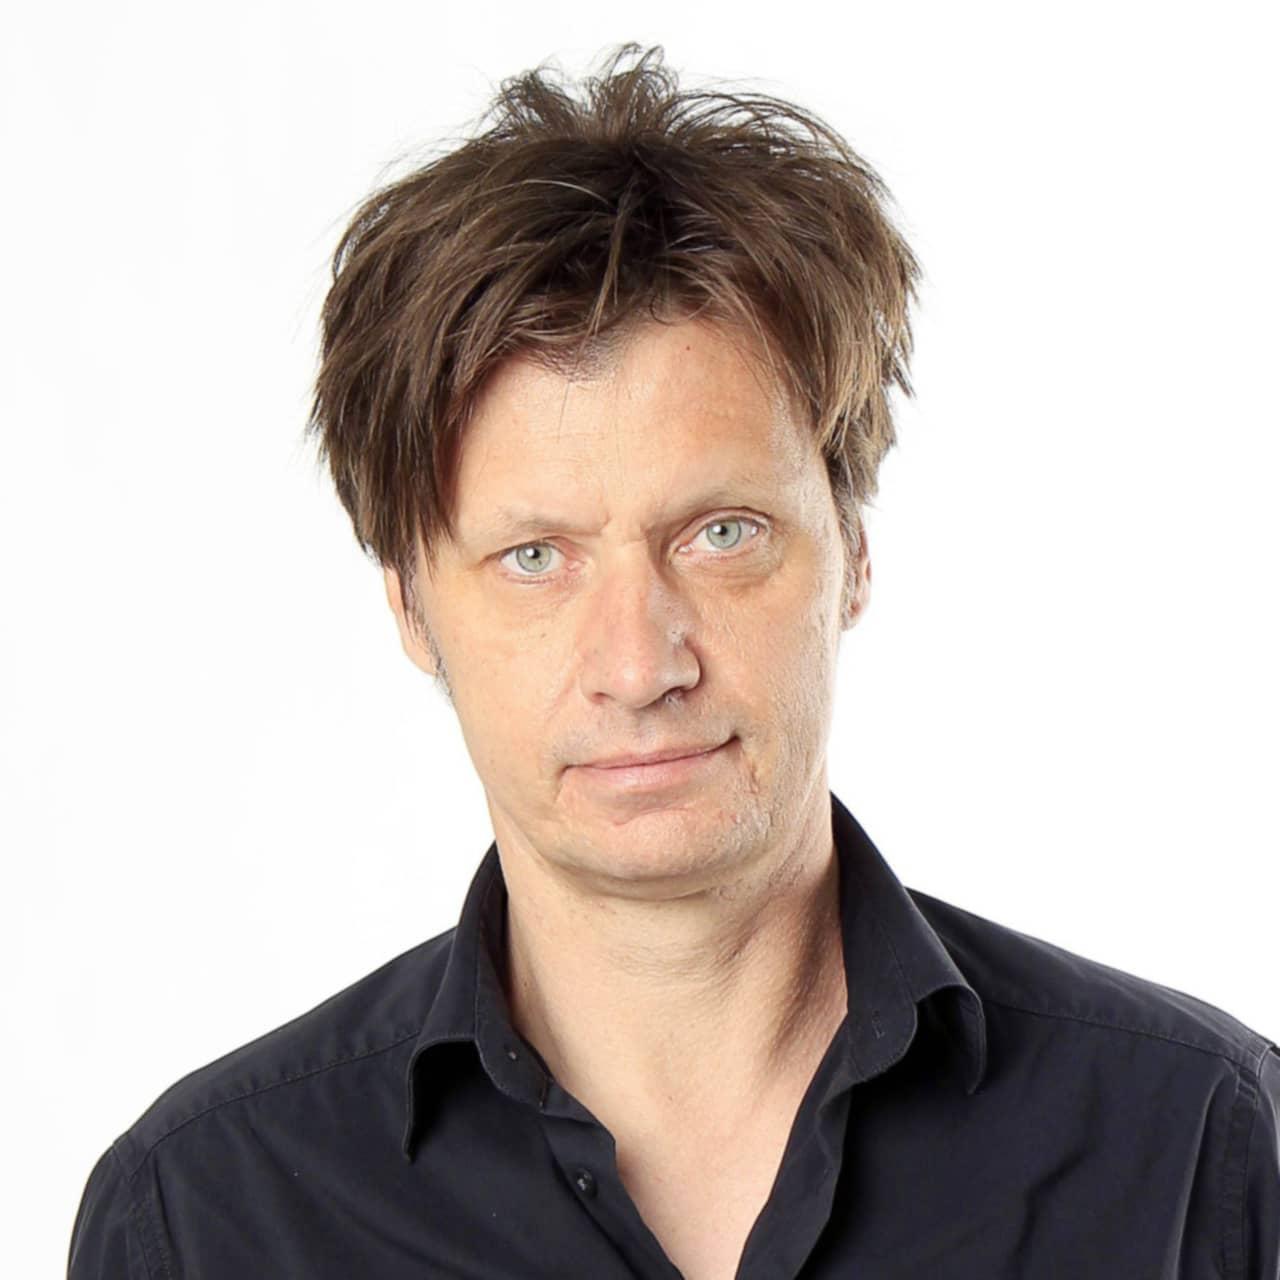 Kai-Anders Nilsson